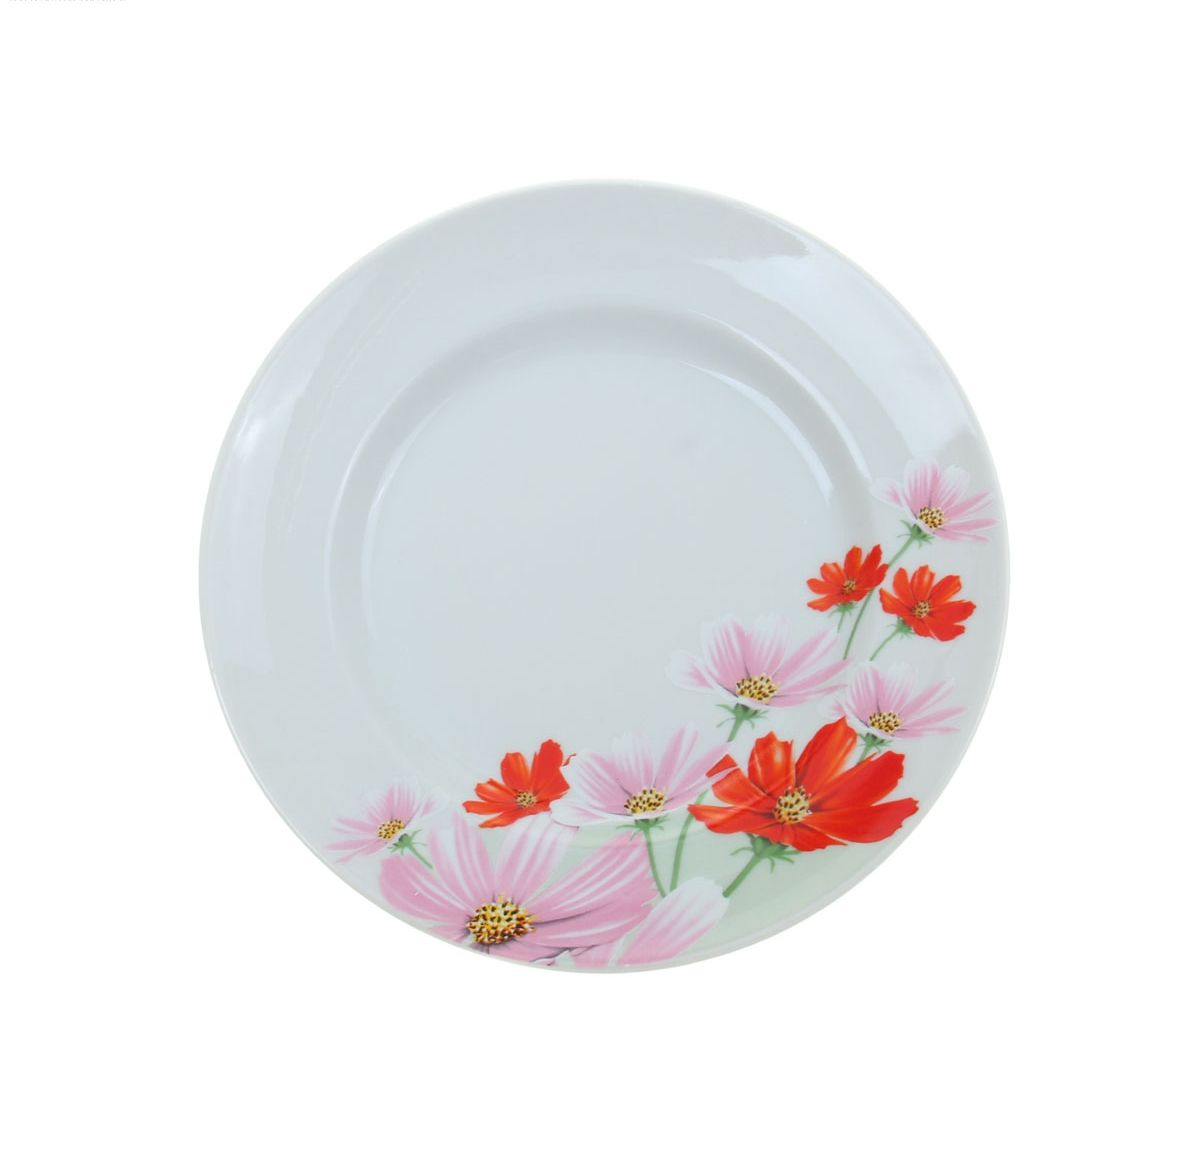 Тарелка мелкая Идиллия. Космея, диаметр 20 см тарелка мелкая сотвори чудо бантик sans brides диаметр 20 см